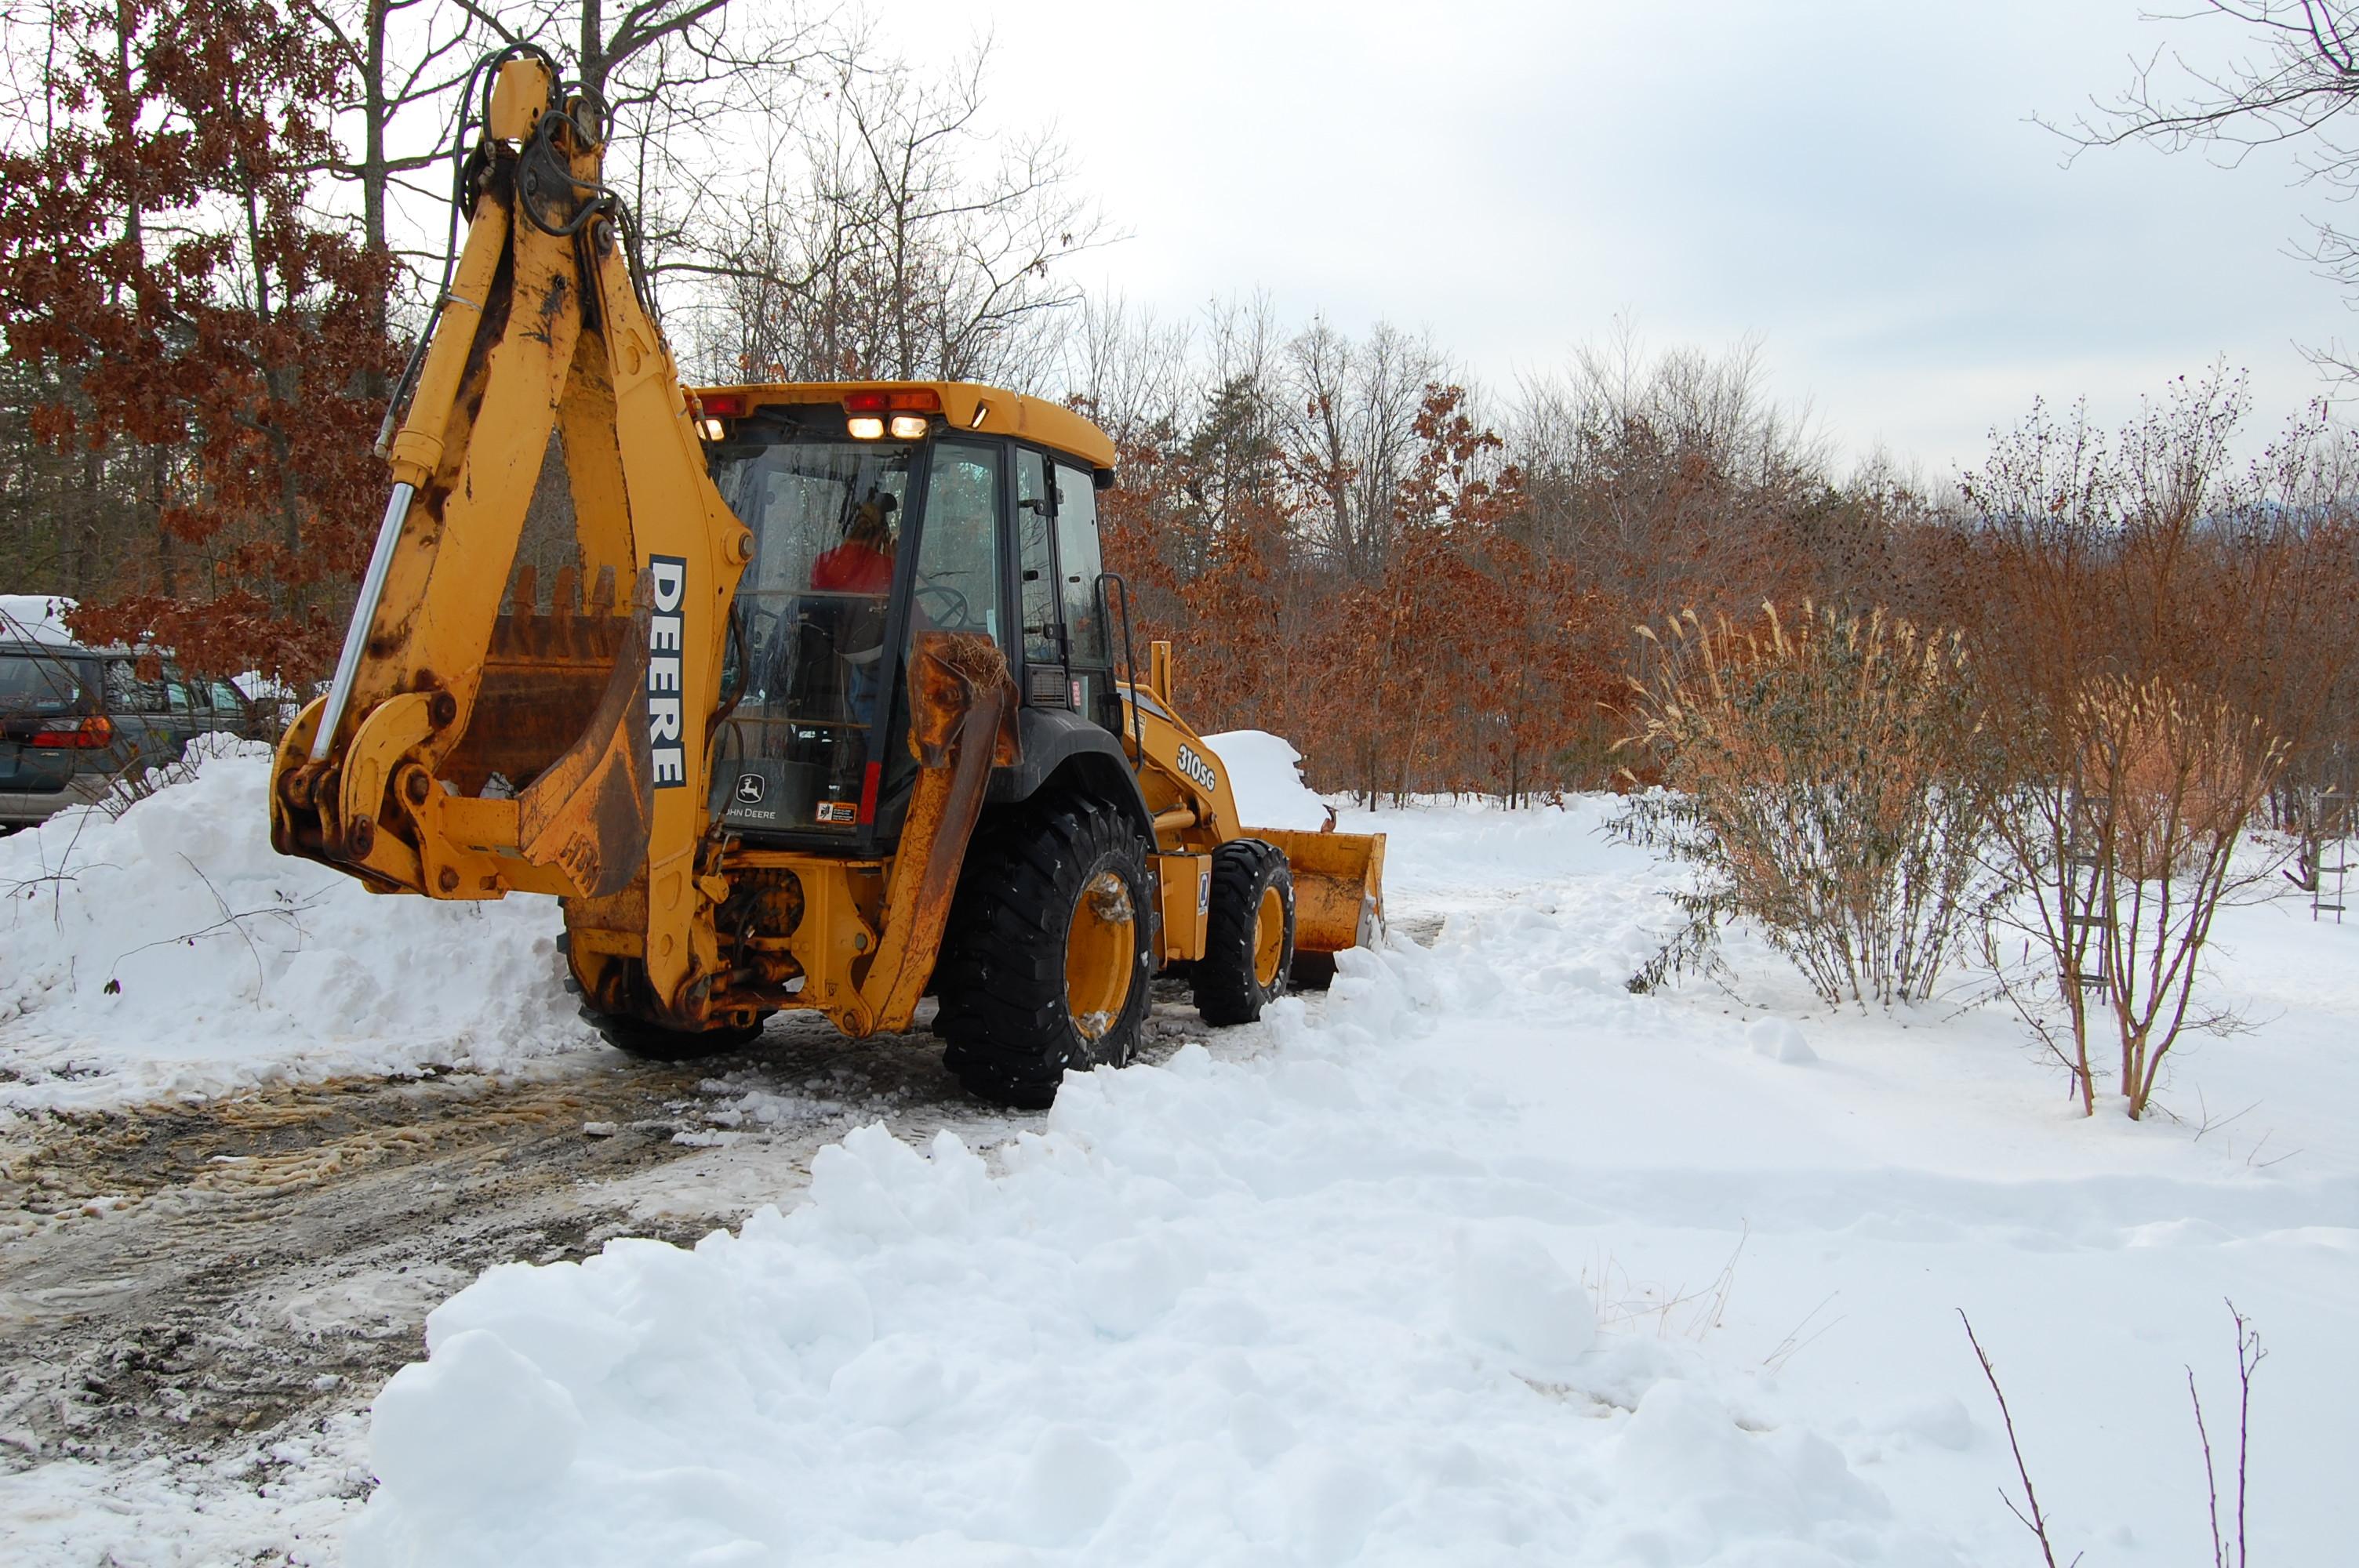 John Deere 310sg Manual Auto Electrical Wiring Diagram File Backhoe Loader Snow Removal 3